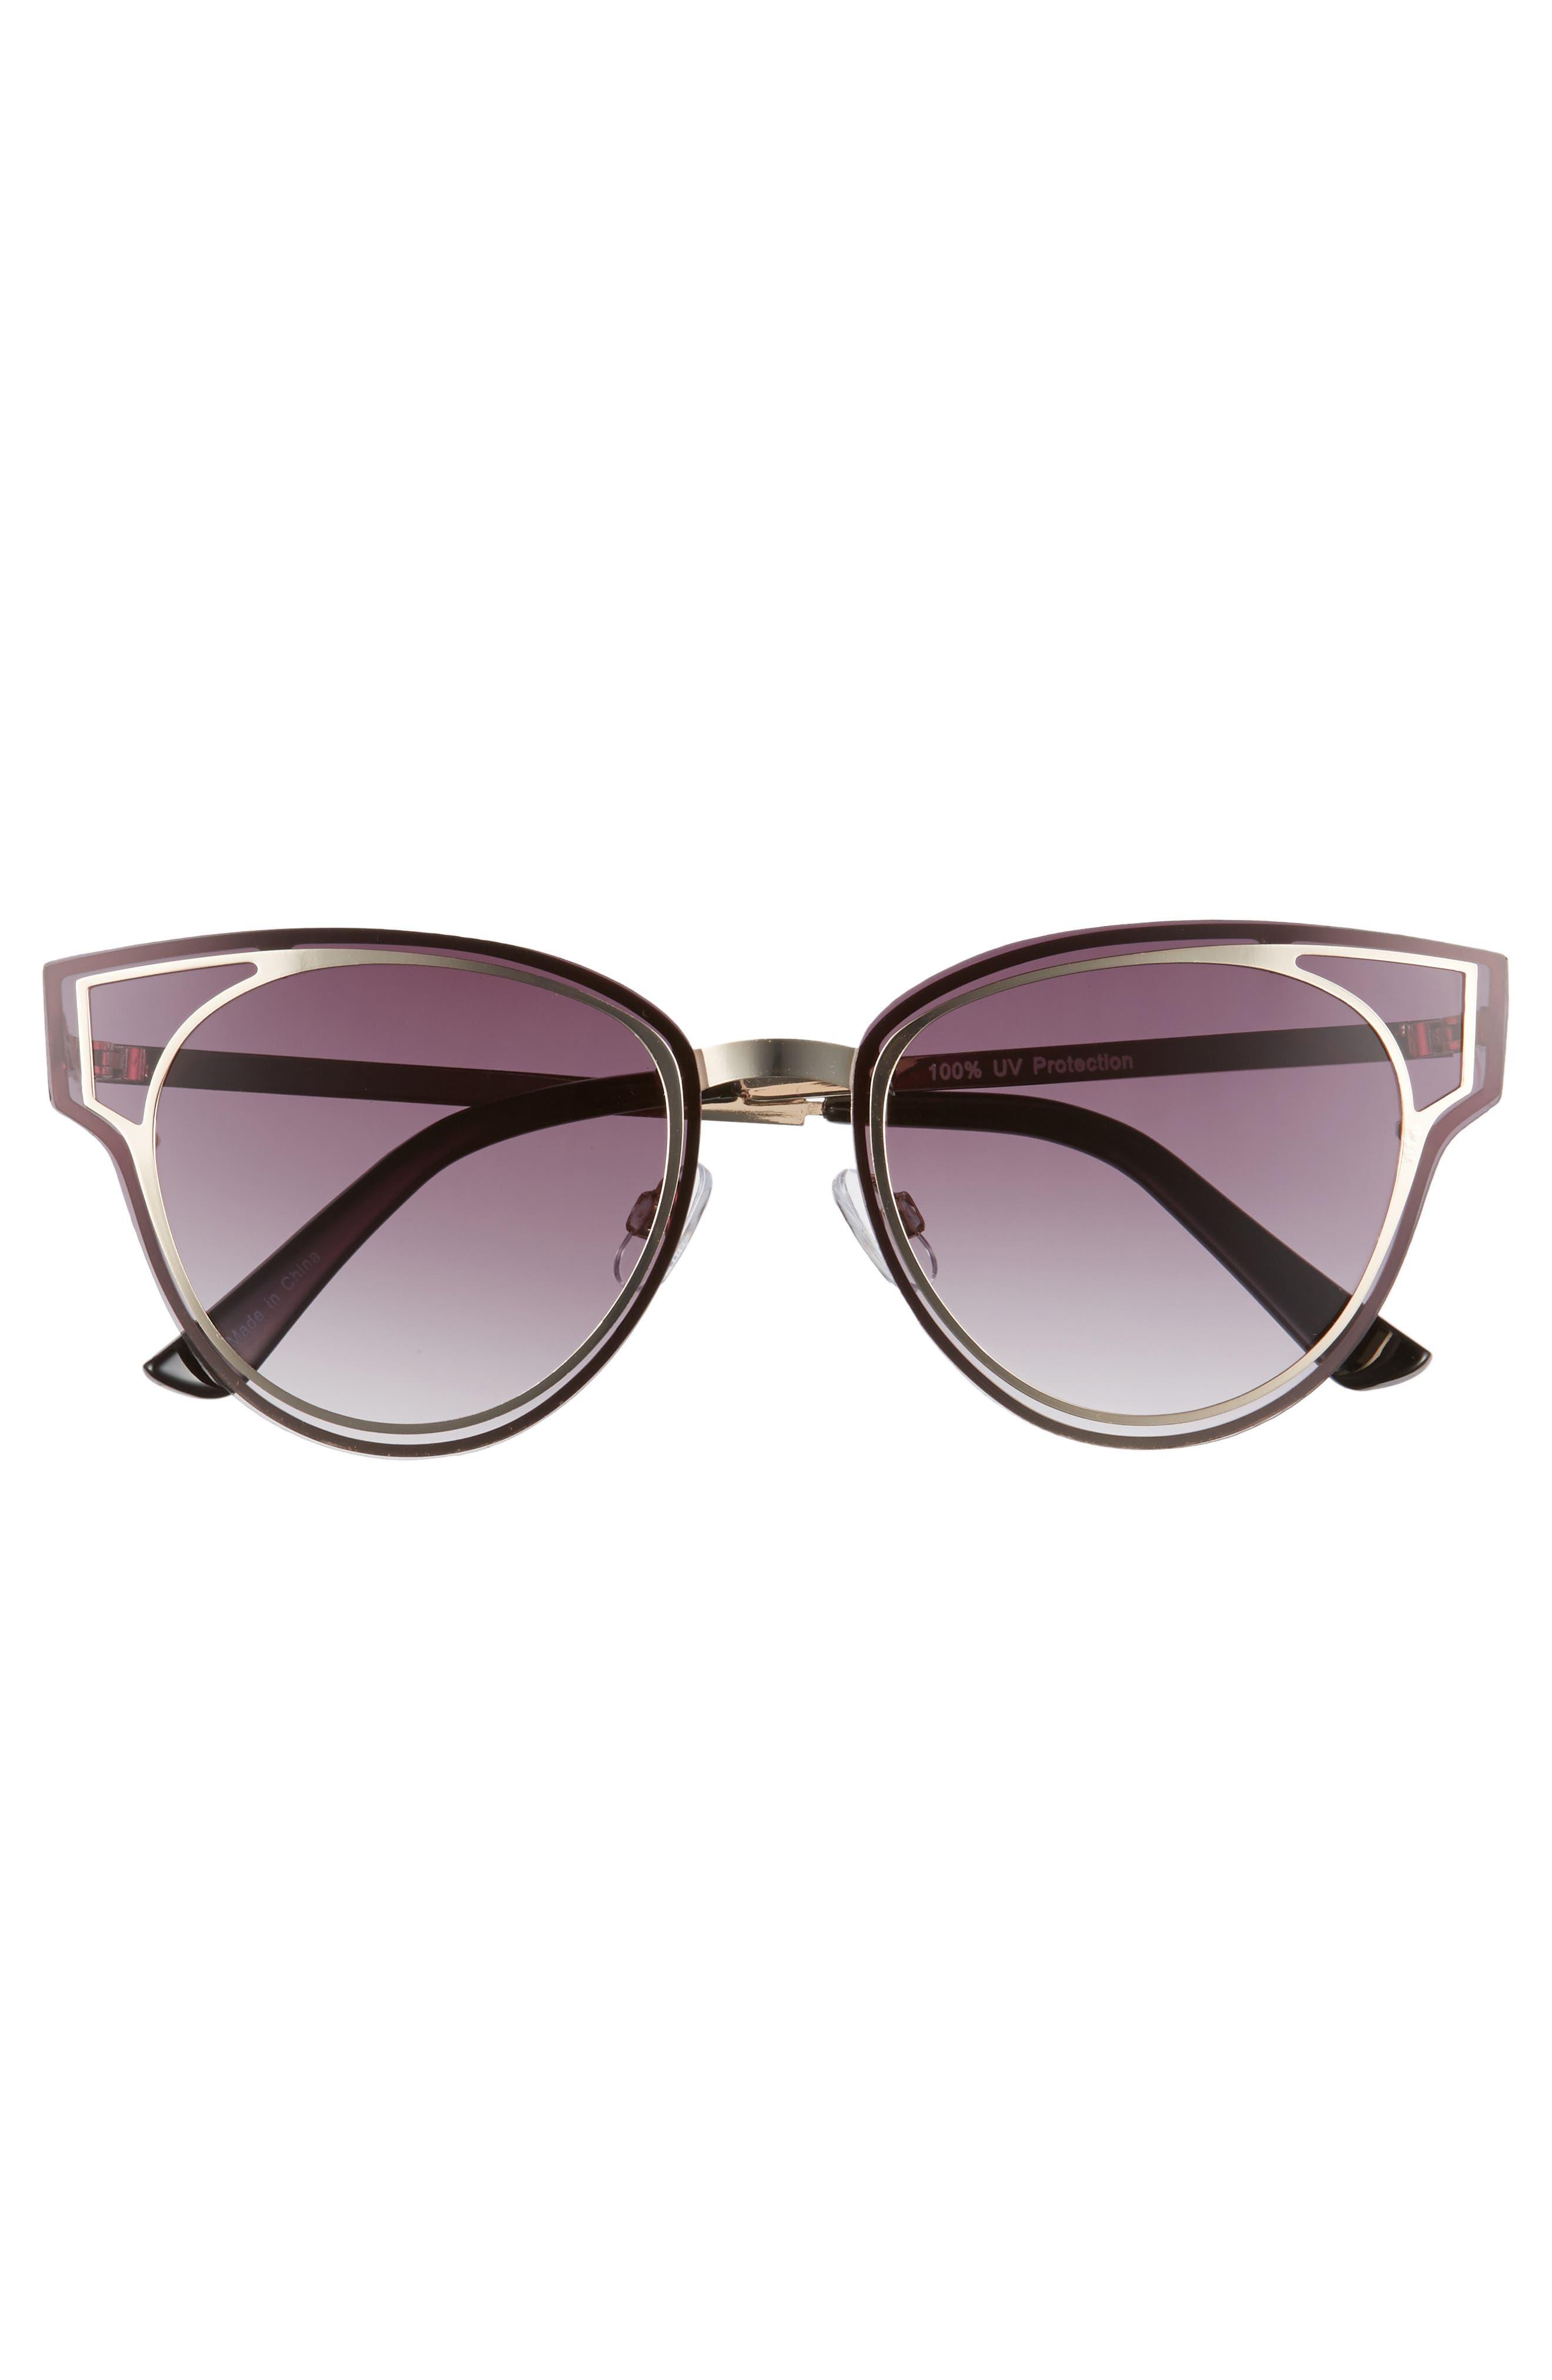 Geo Flat Metal Cutout Sunglasses,                             Alternate thumbnail 3, color,                             Gold/ Smoke